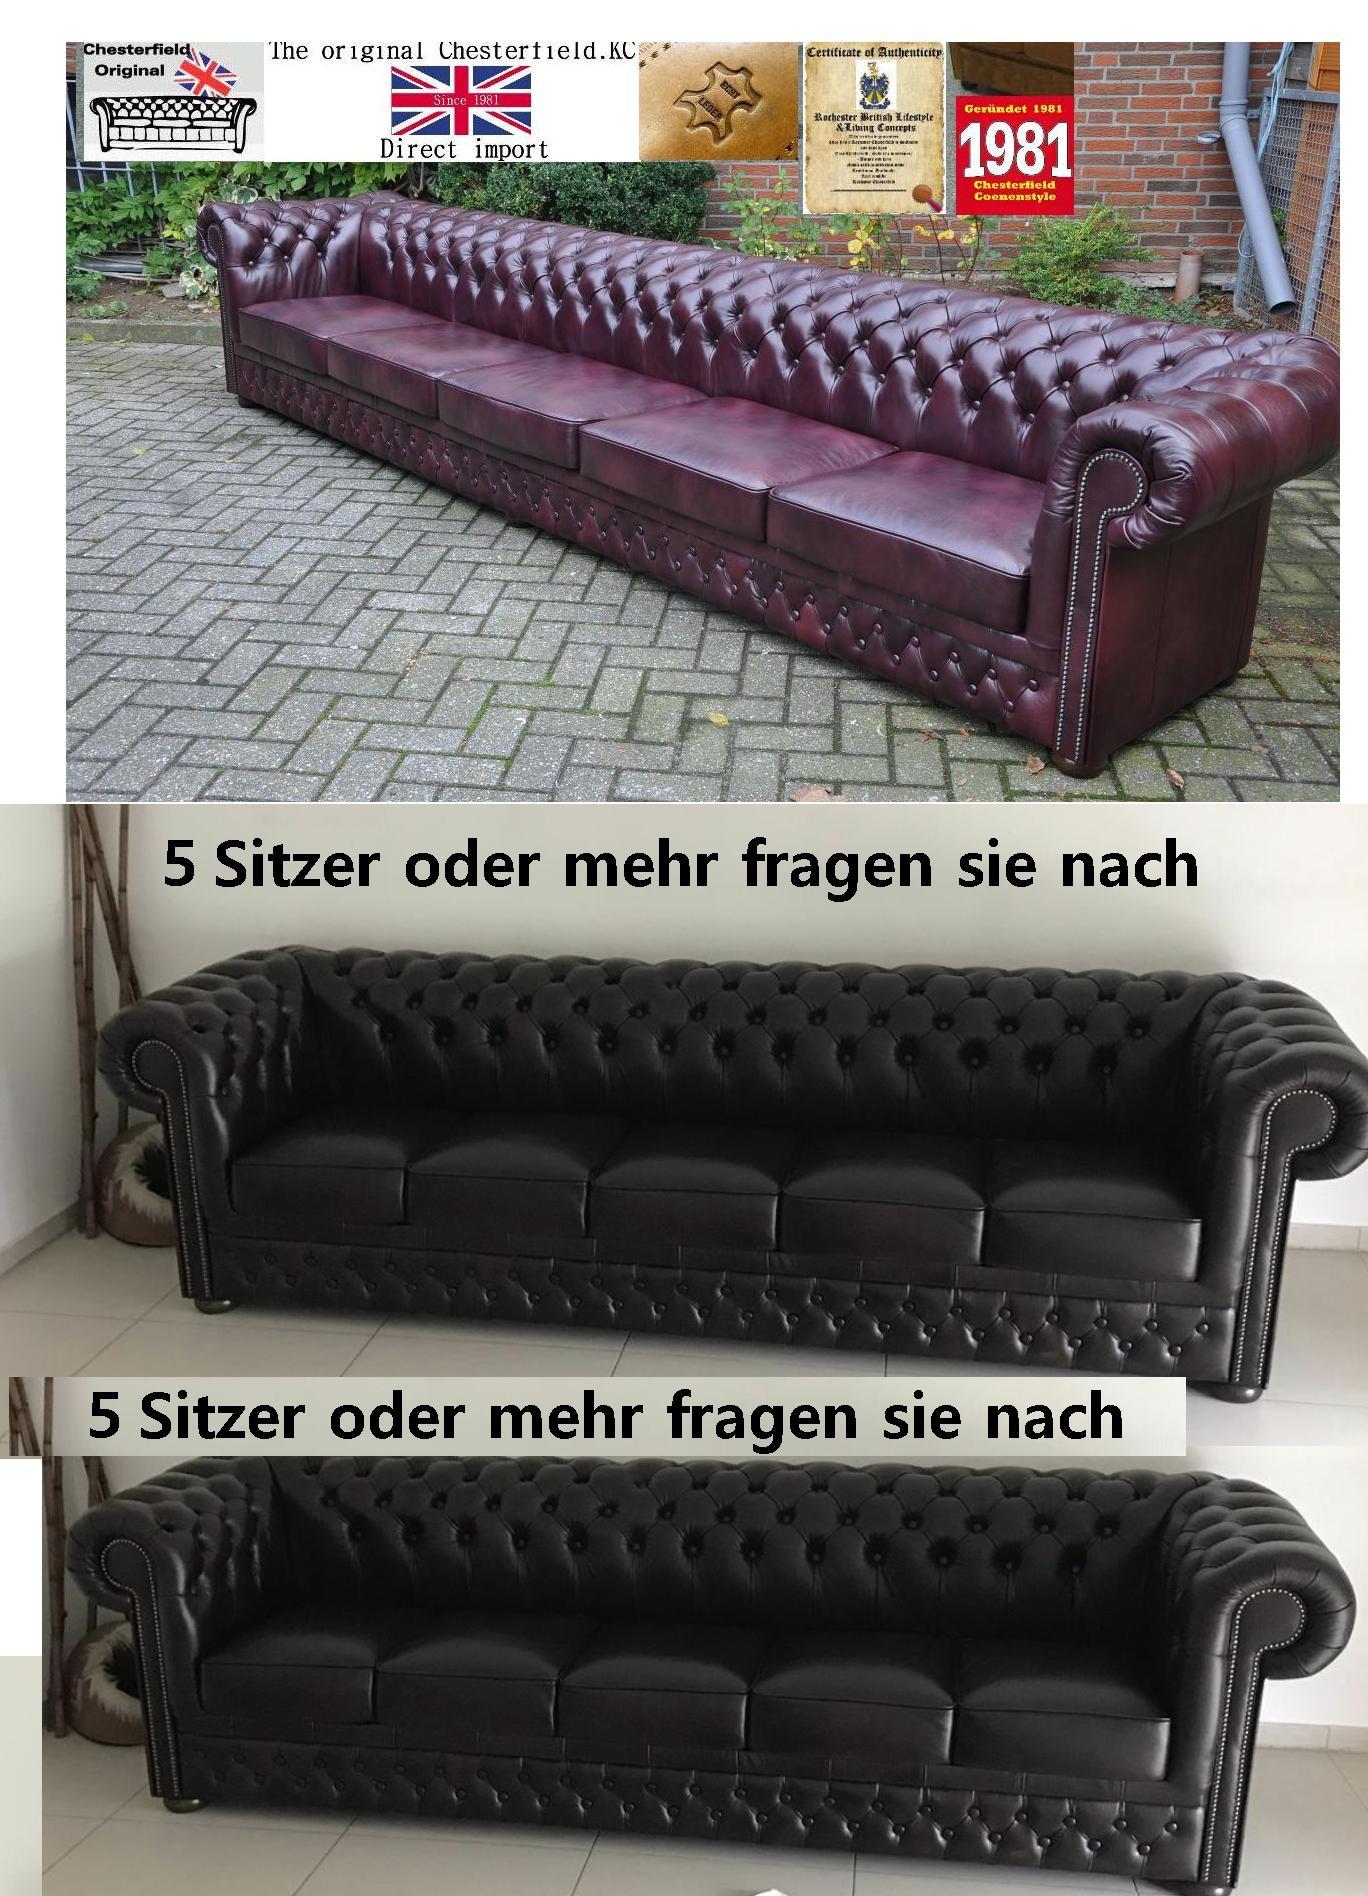 Chesterfield rochester kc claridge 4 meter sofa 2018 xxl for Sofa 4 meter